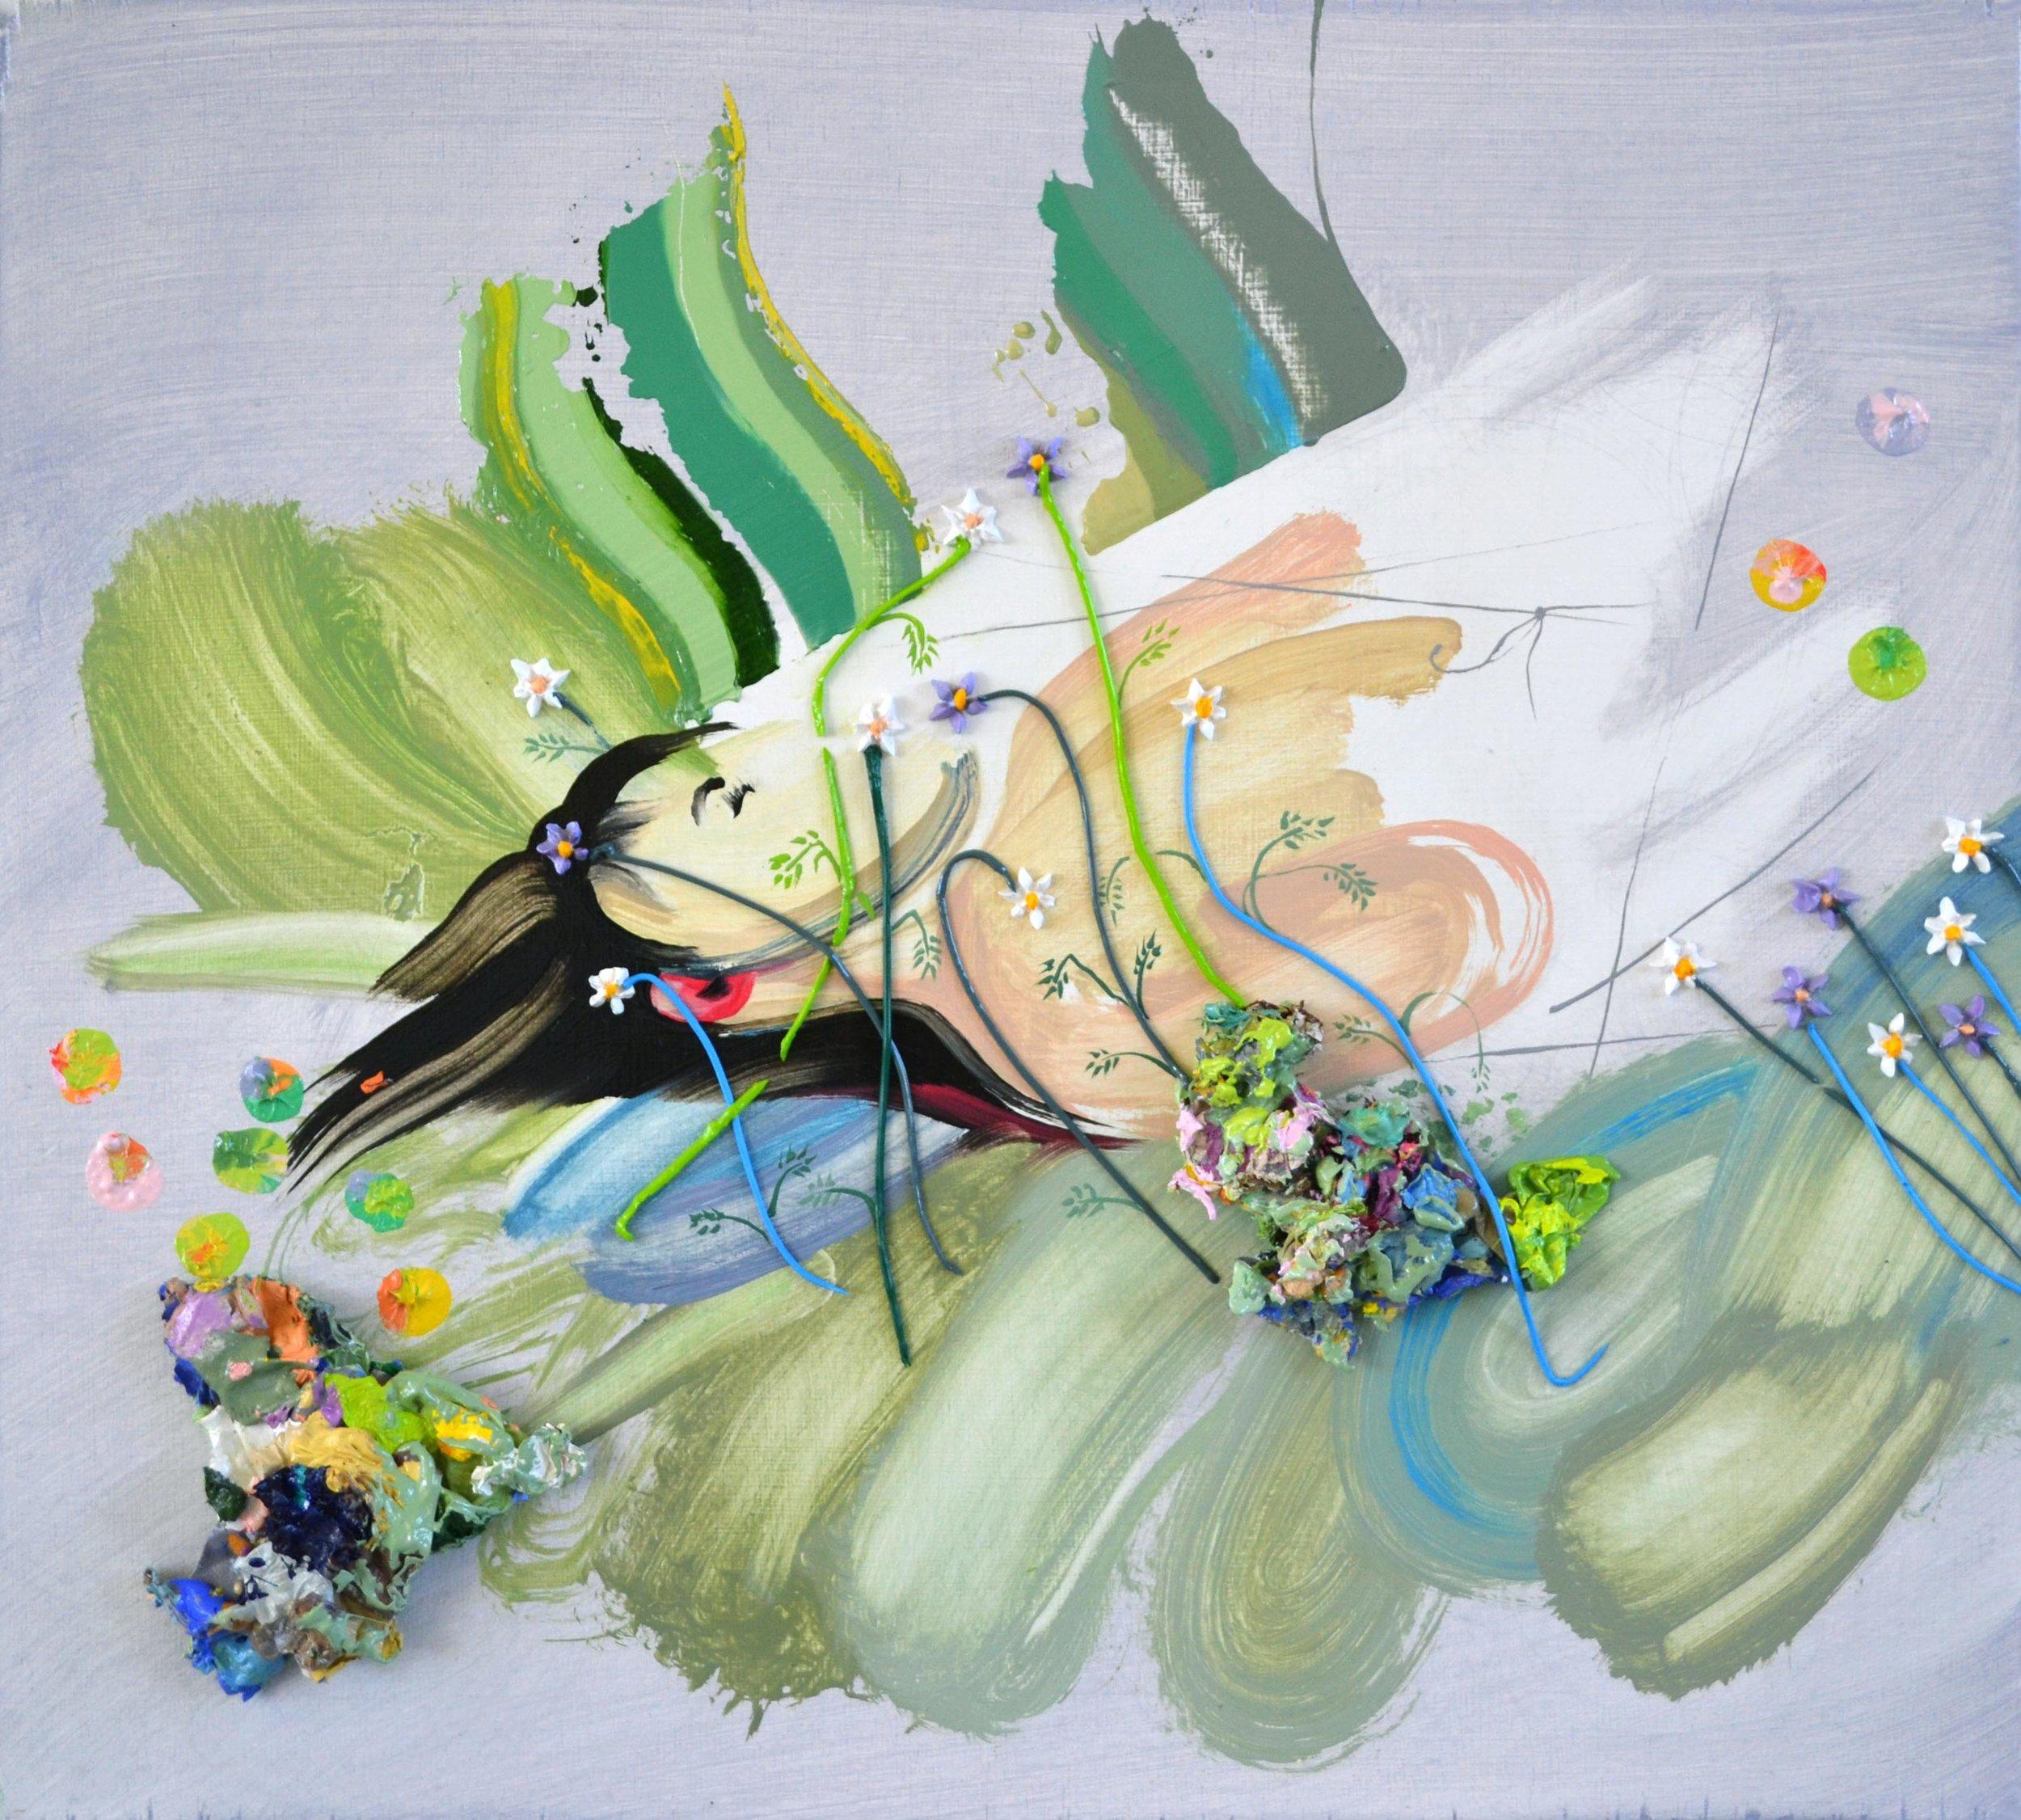 Untitled (After Wyeth)